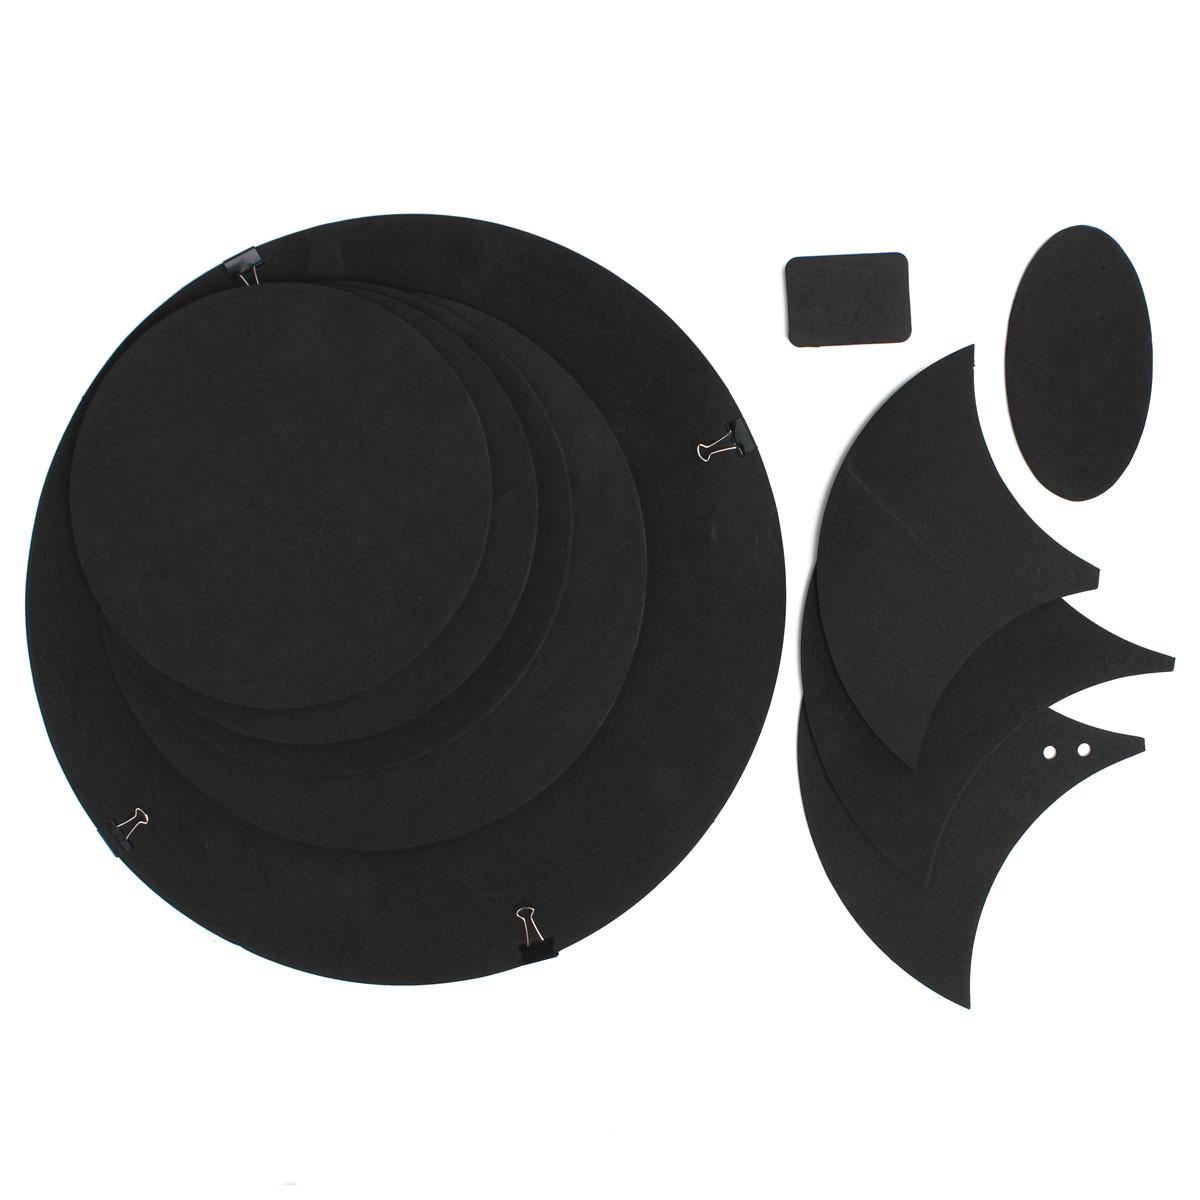 Bunyi Terompet Langsung Bisu Sourdine Aluminium Paduan Perak Source · 10 Buah Snare Drum Bass Soundoff Diam Bisu Peredam Suara Drum